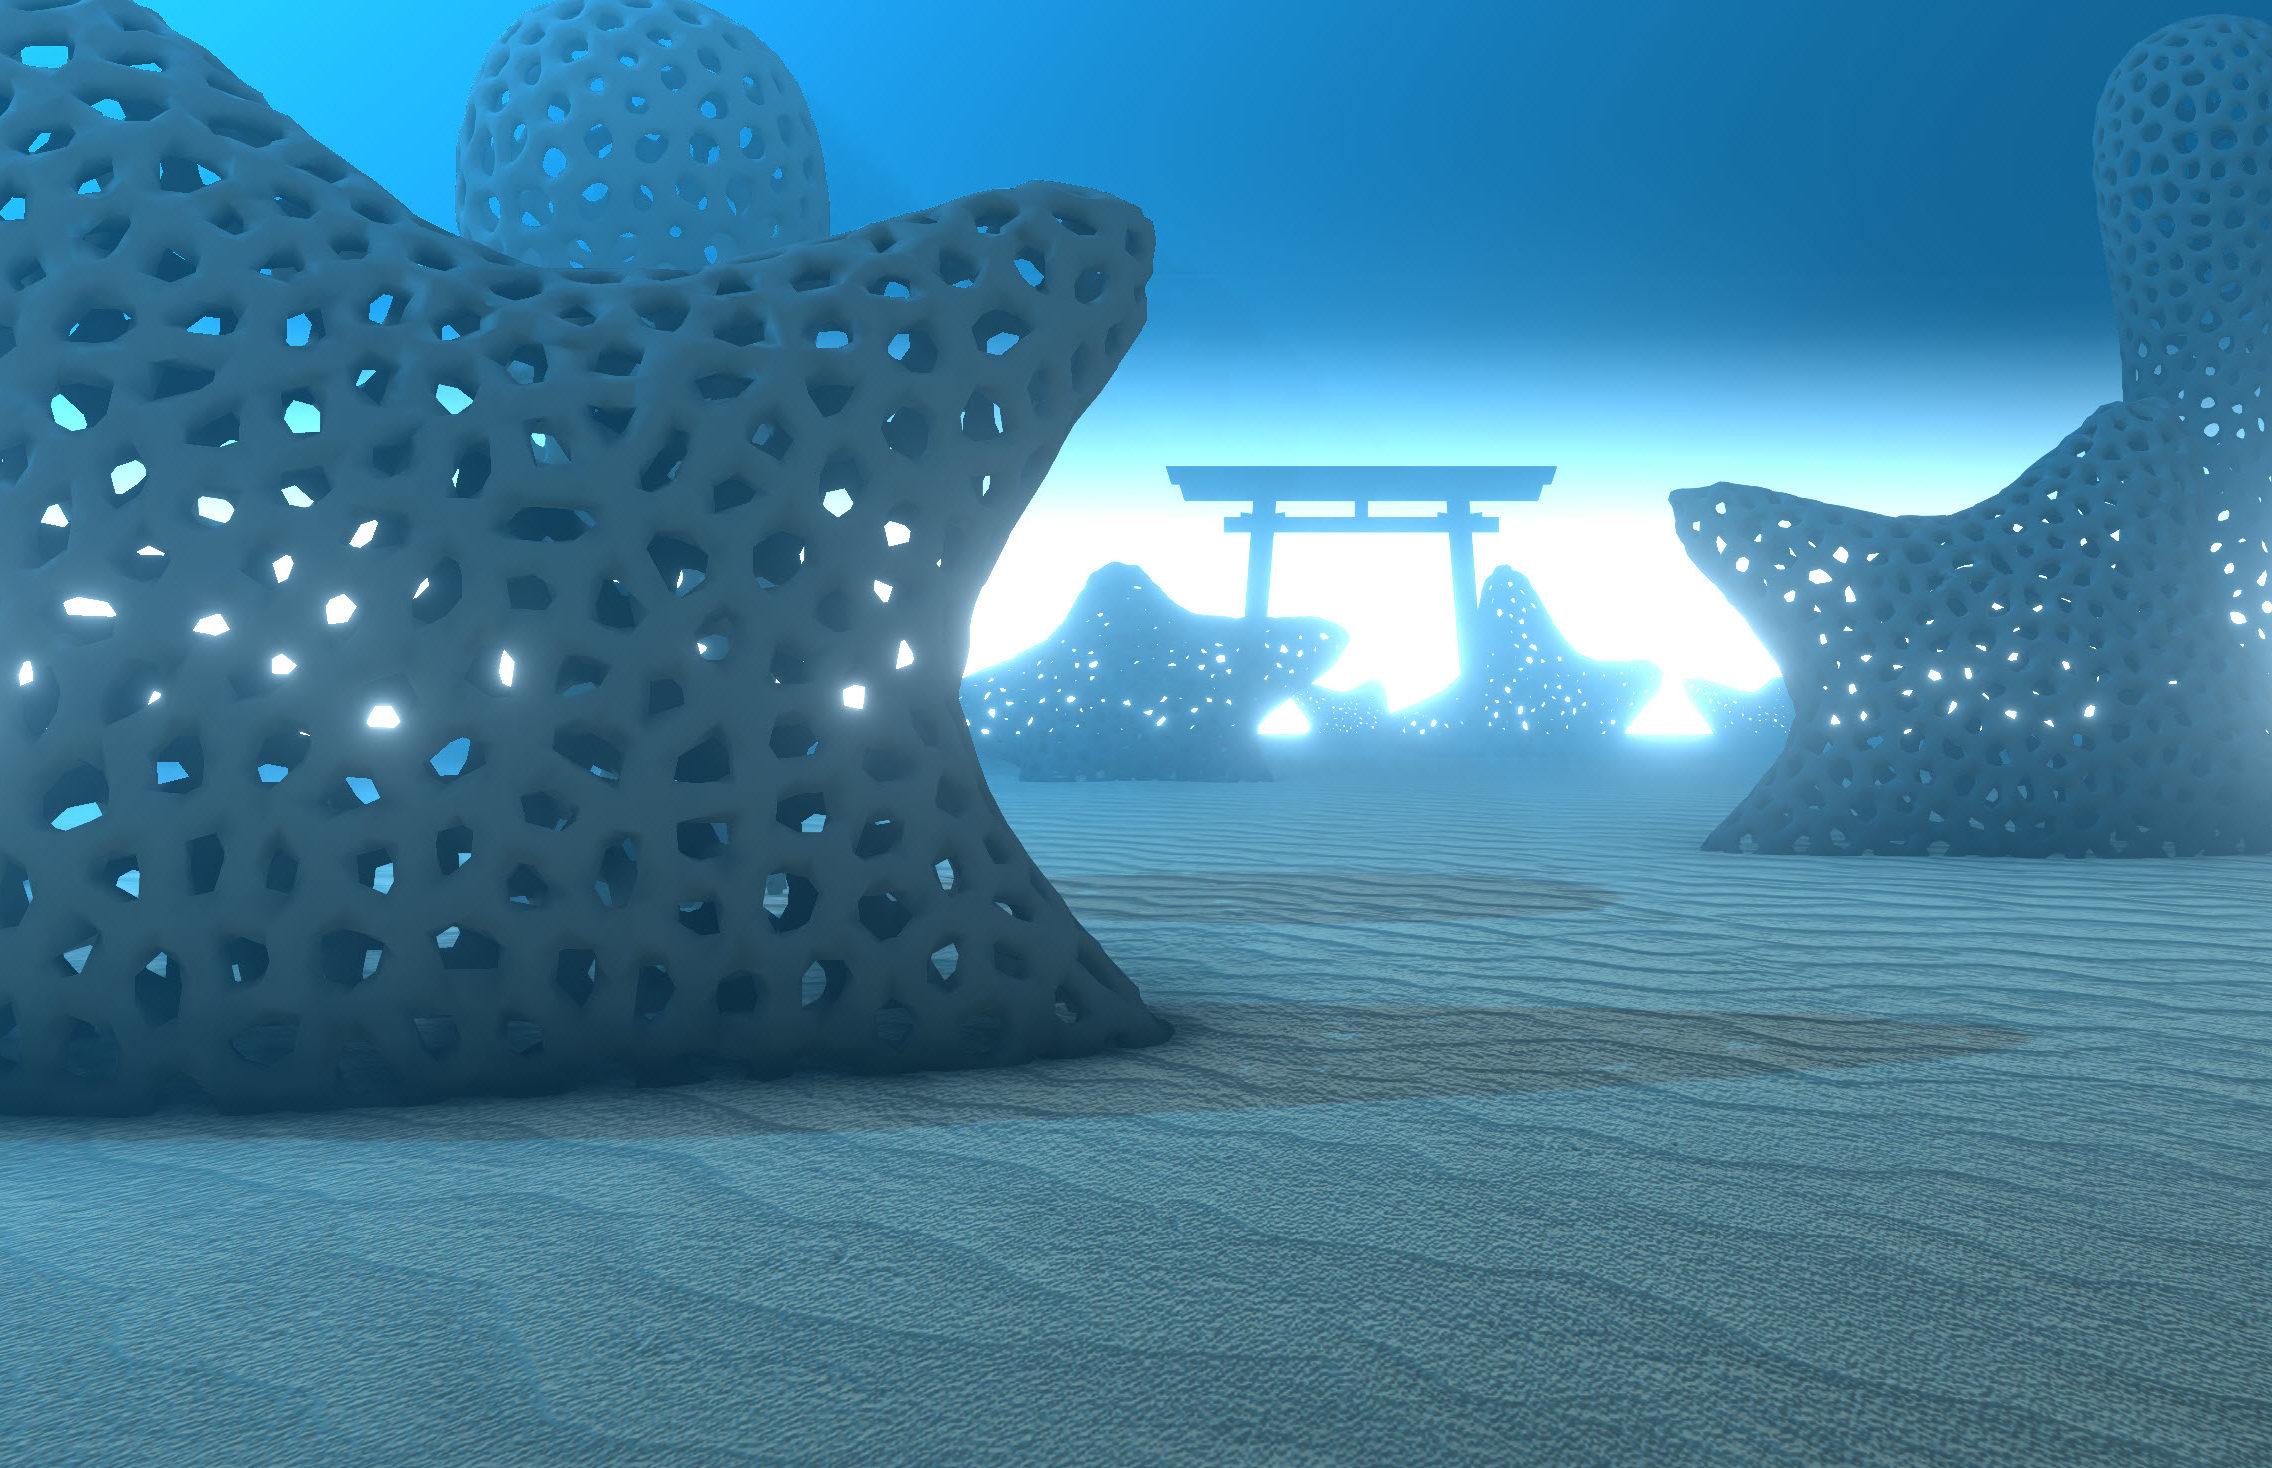 HOSHIZUNA NO HAMA - The Starry Sand Beach